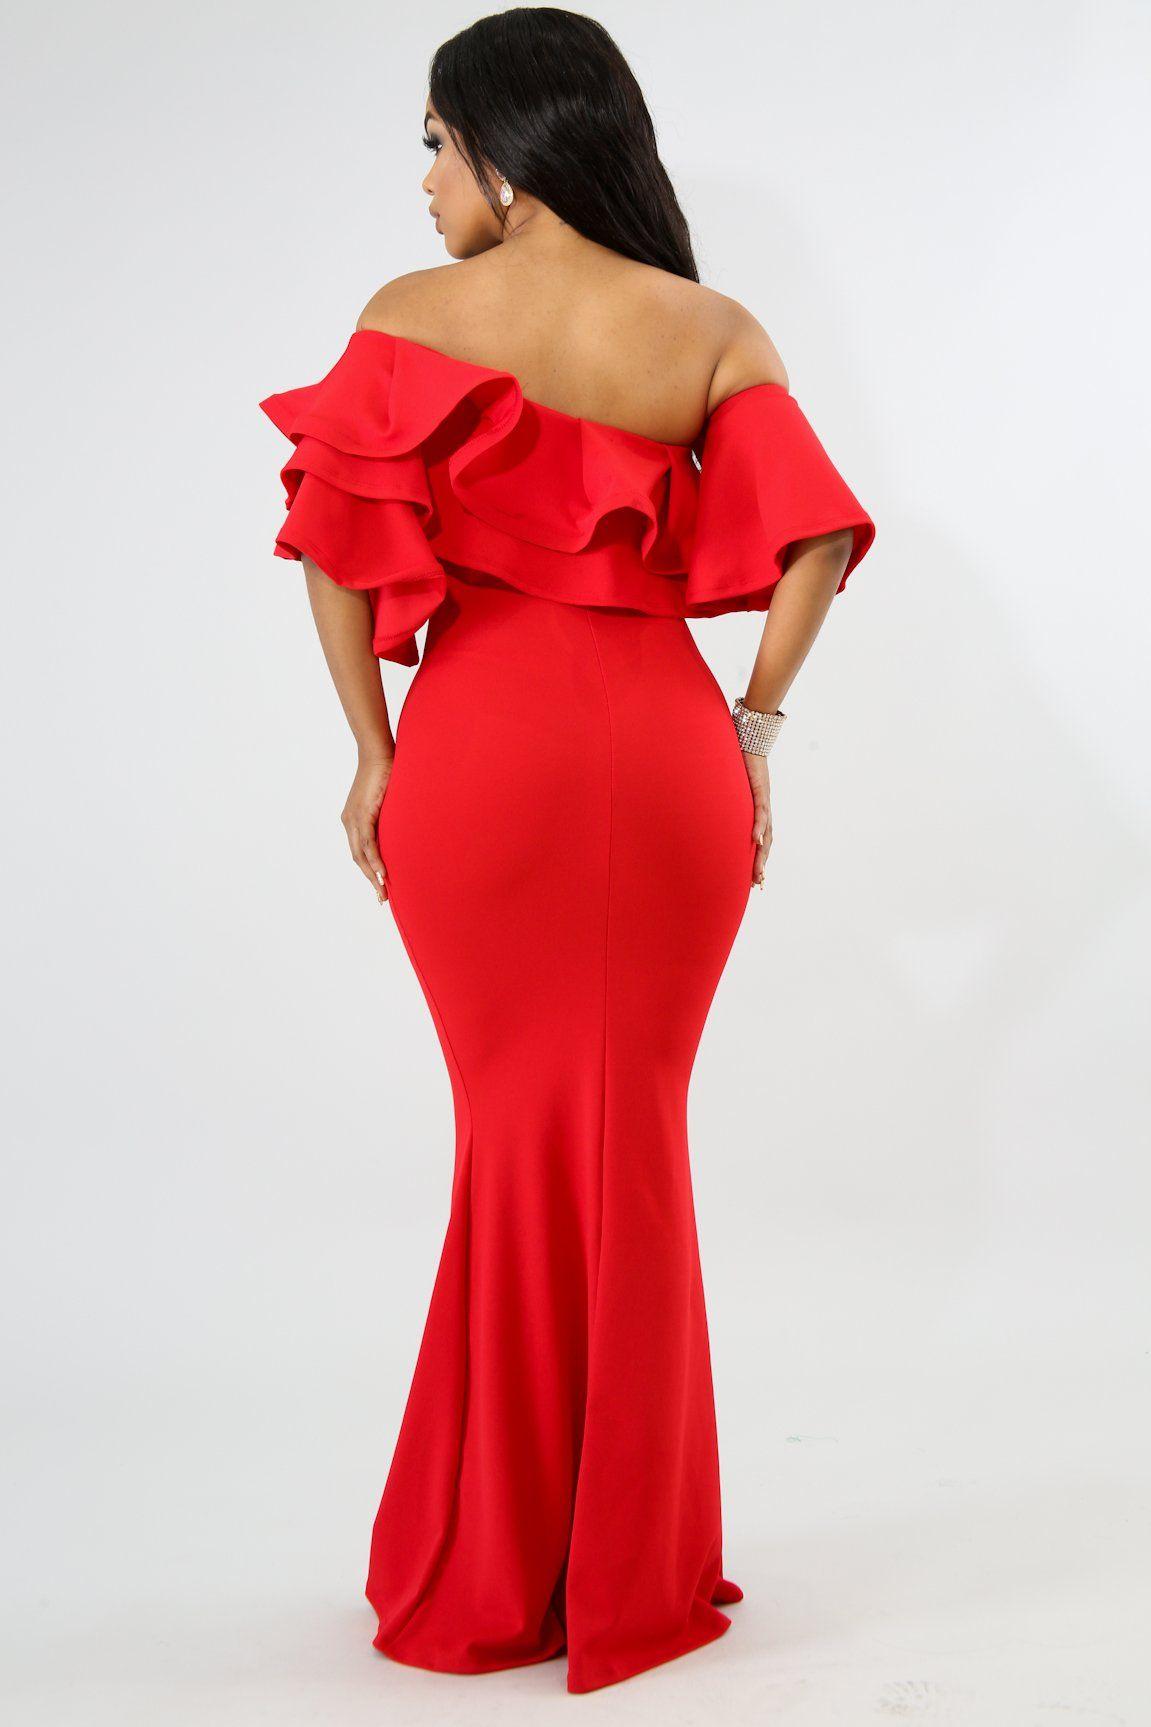 Description This Flare Design Maxi Dress Features A Stretchy Fabric Off Shoulder Neckline Pleated Flare Sleeves F Maxi Dress With Sleeves Dresses Maxi Dress [ 1727 x 1151 Pixel ]